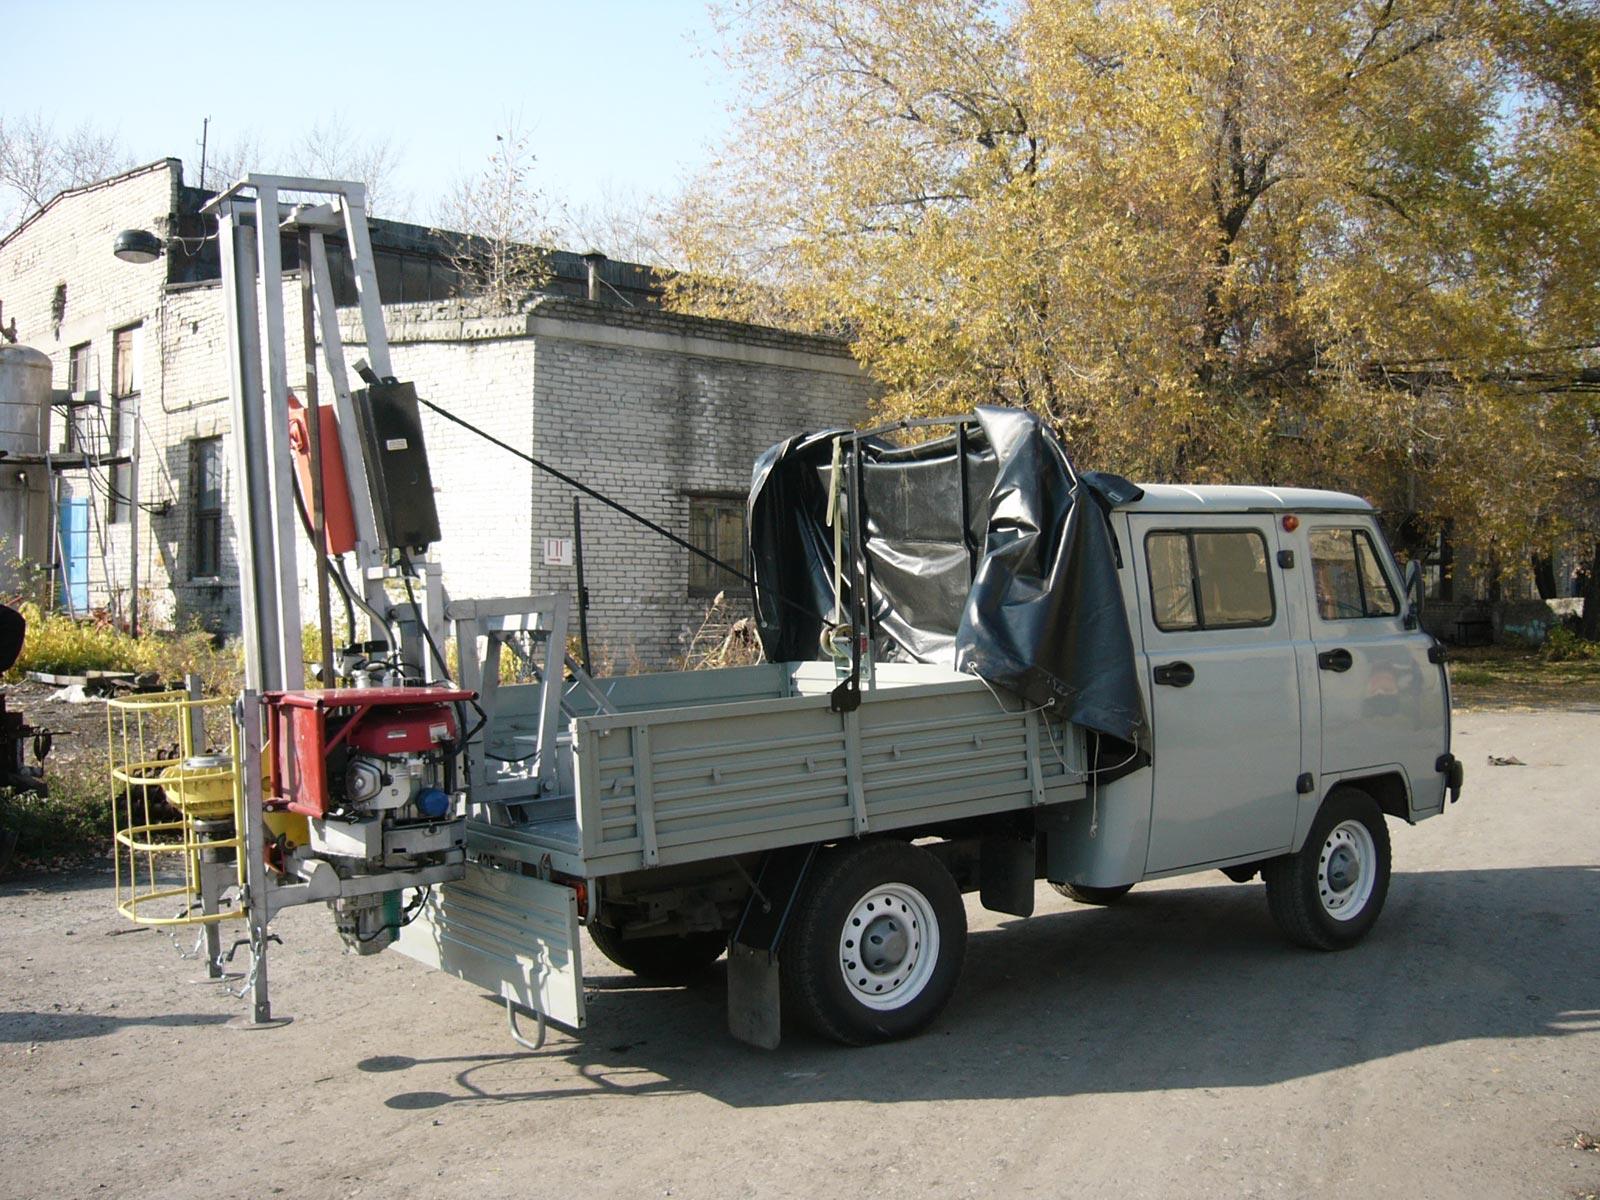 Установка буровая шнековая малогабаритная УБШМ-1-20 на базе УАЗ Фермер